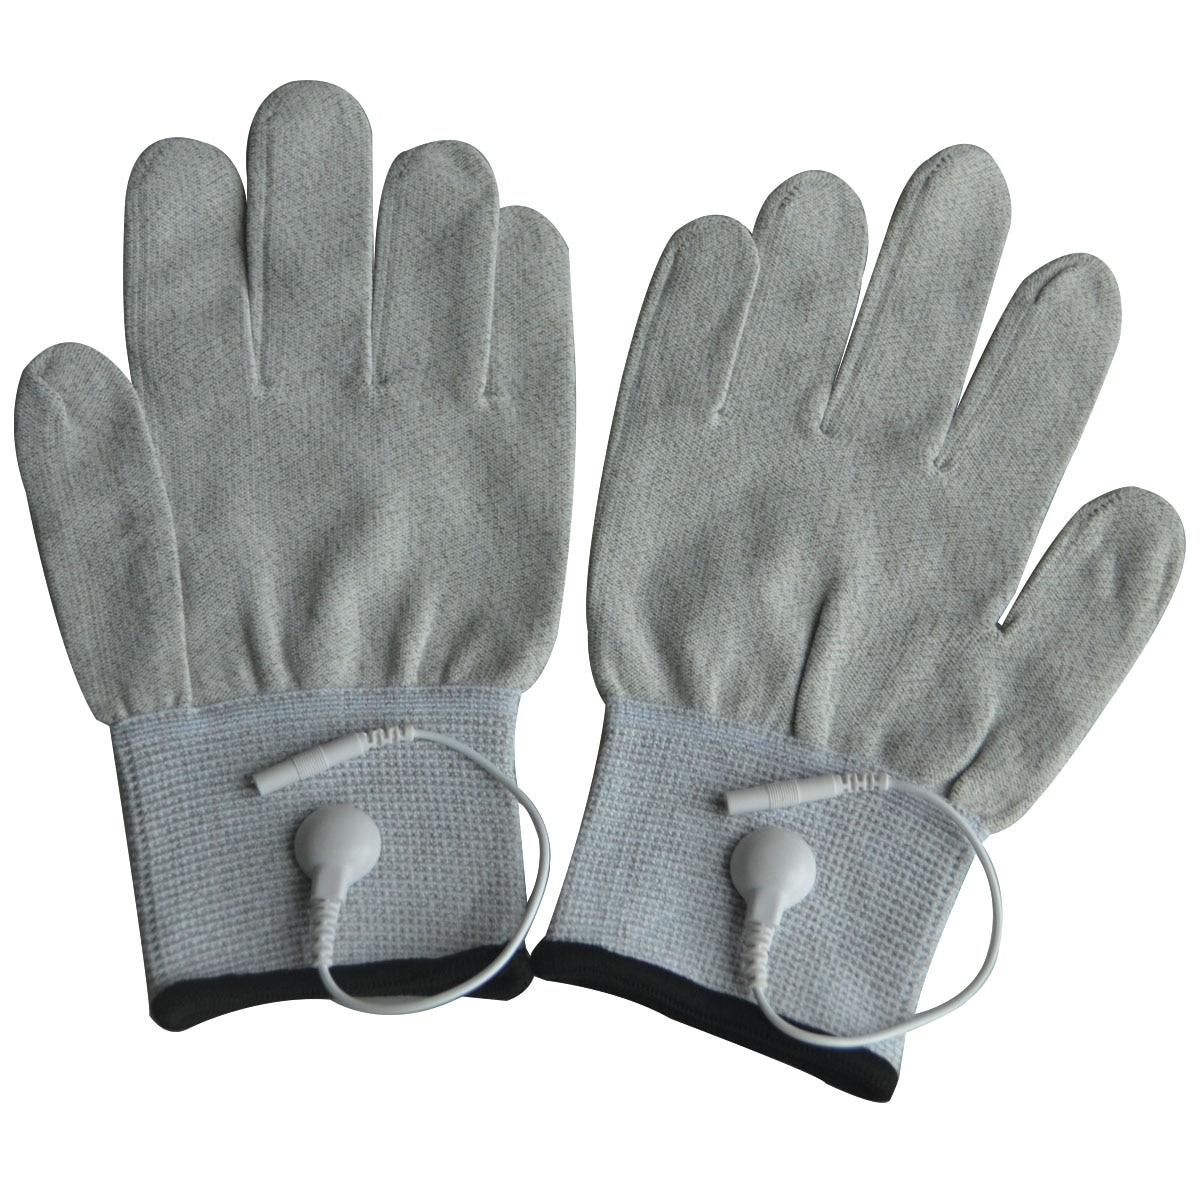 10 Pairs/Pack Conductive Massage Gloves physiotherapy electrotherapy electrode Gloves Use with Tens Massage Light Gray цена